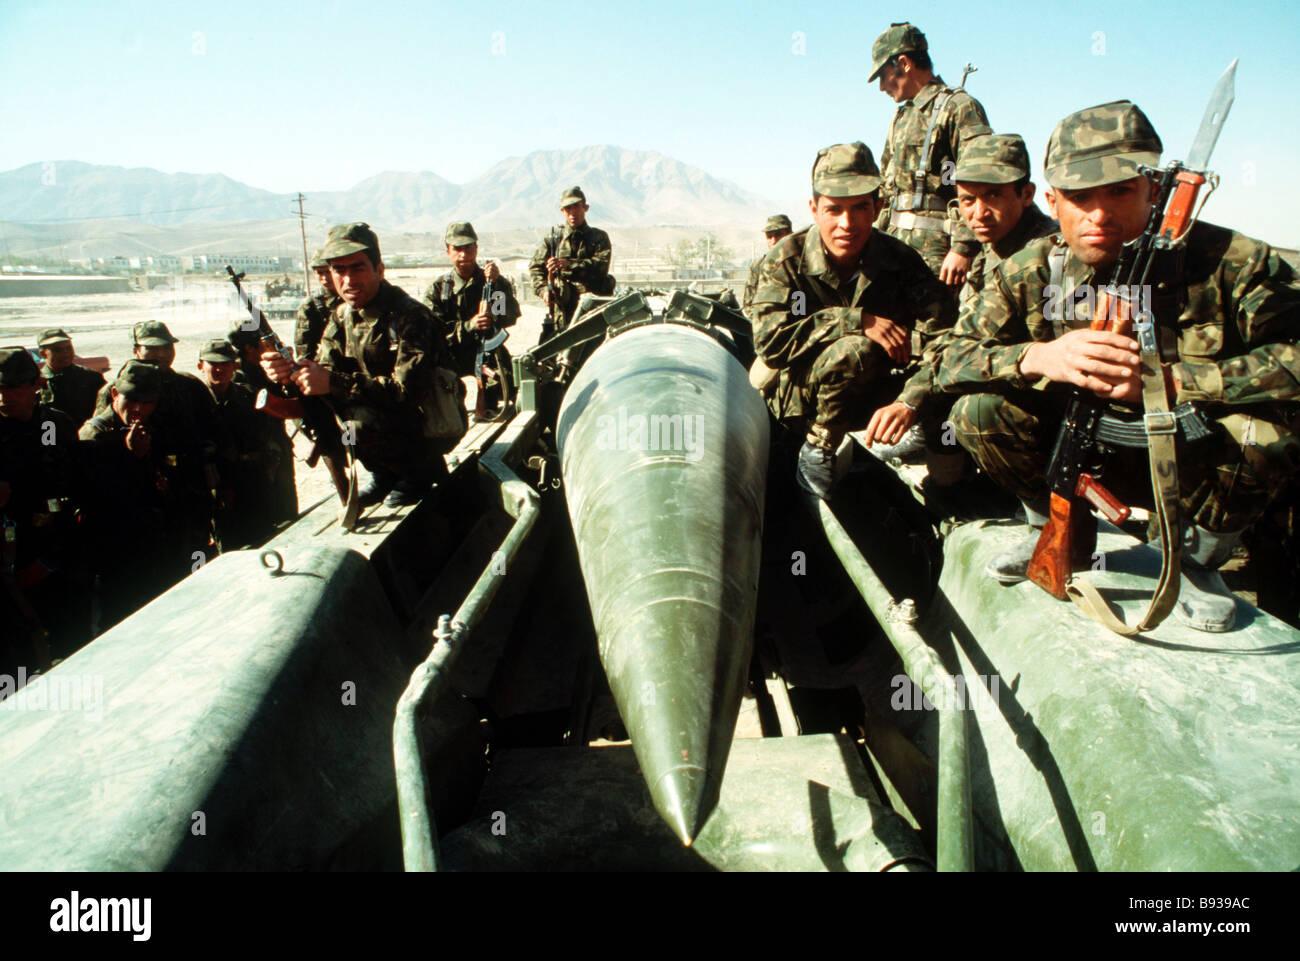 Soviet Afghanistan war - Page 6 Soviet-soldiers-in-afghanistan-B939AC